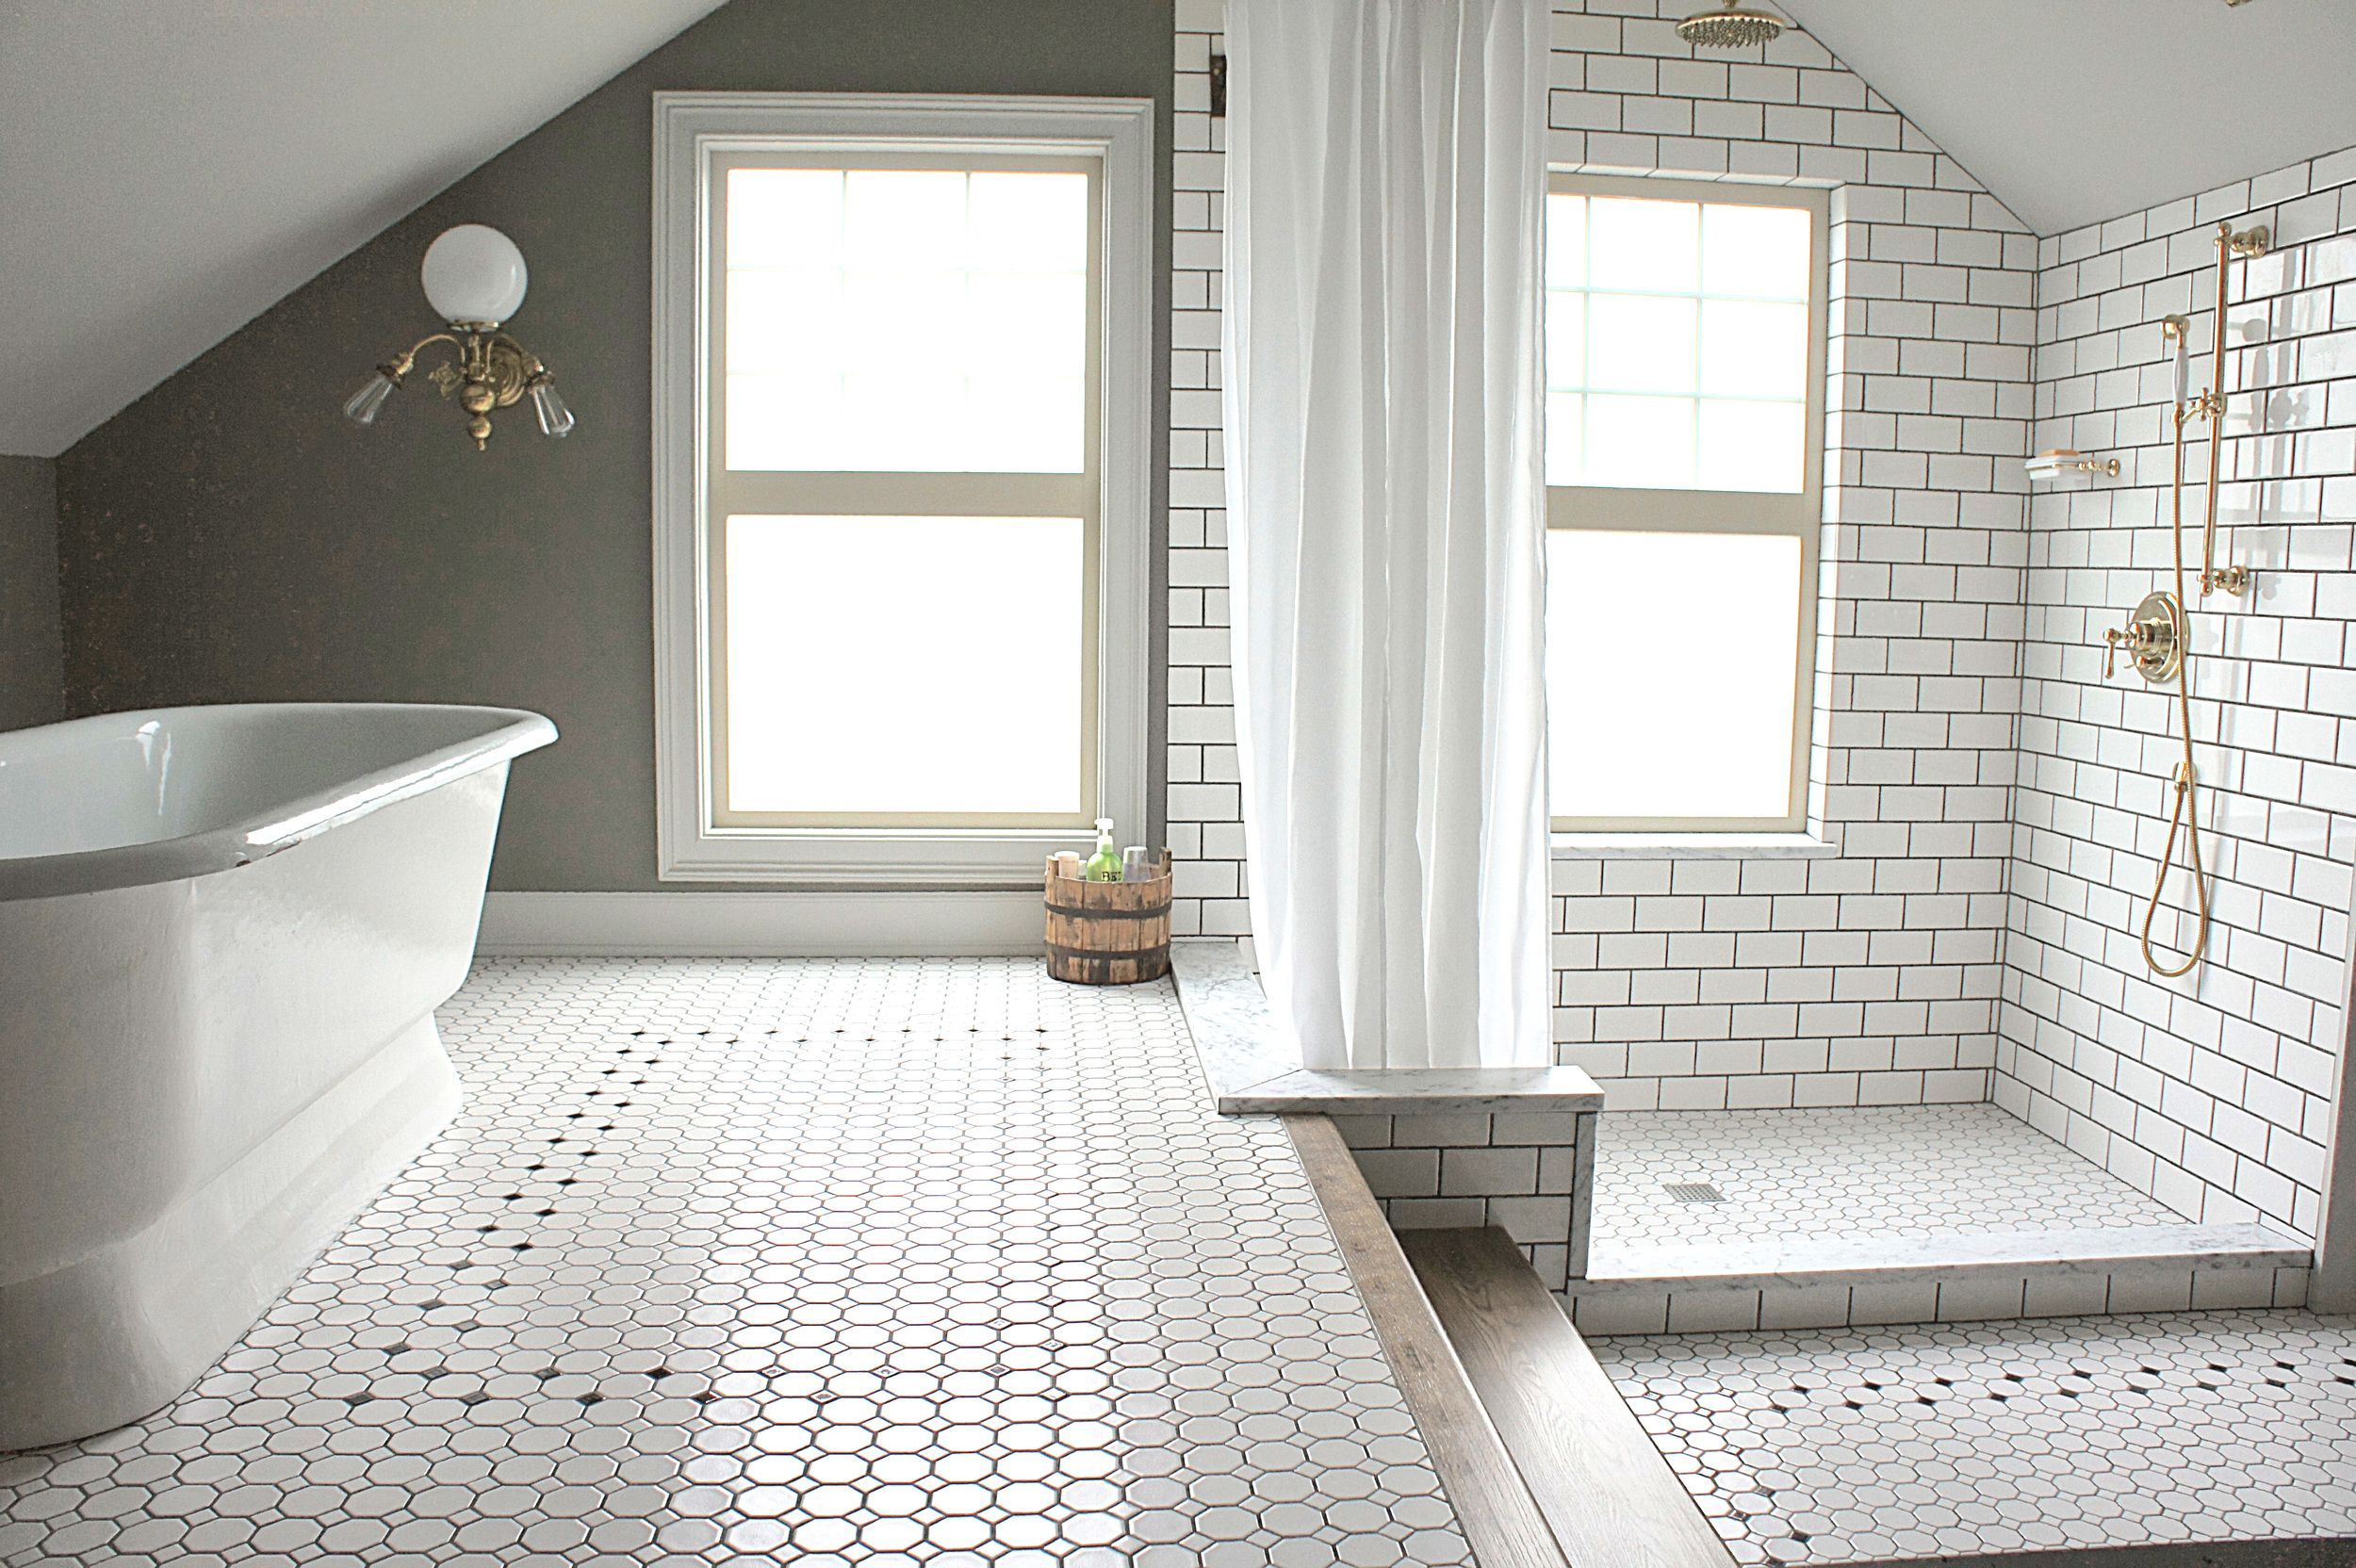 Kaemingkdesign | Bath {clean} | Pinterest | Attic, Open bathroom and ...